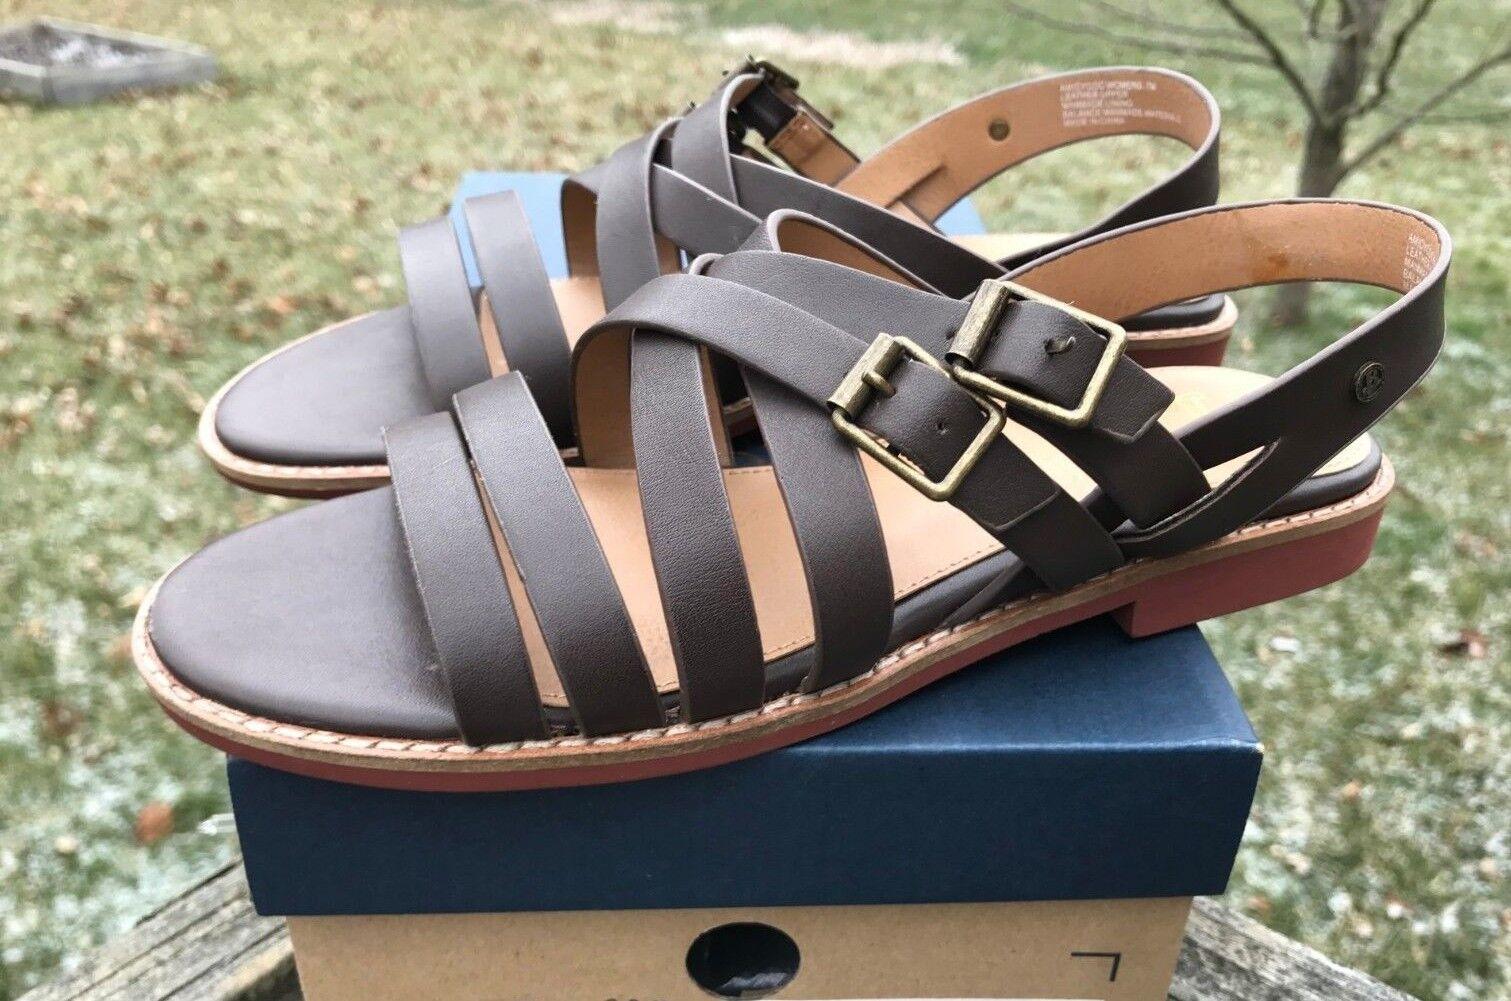 NIB GH Bass & Co. Amidy Strap Buckle Marronee Comfort Leather Sandals Multiple Dimensione